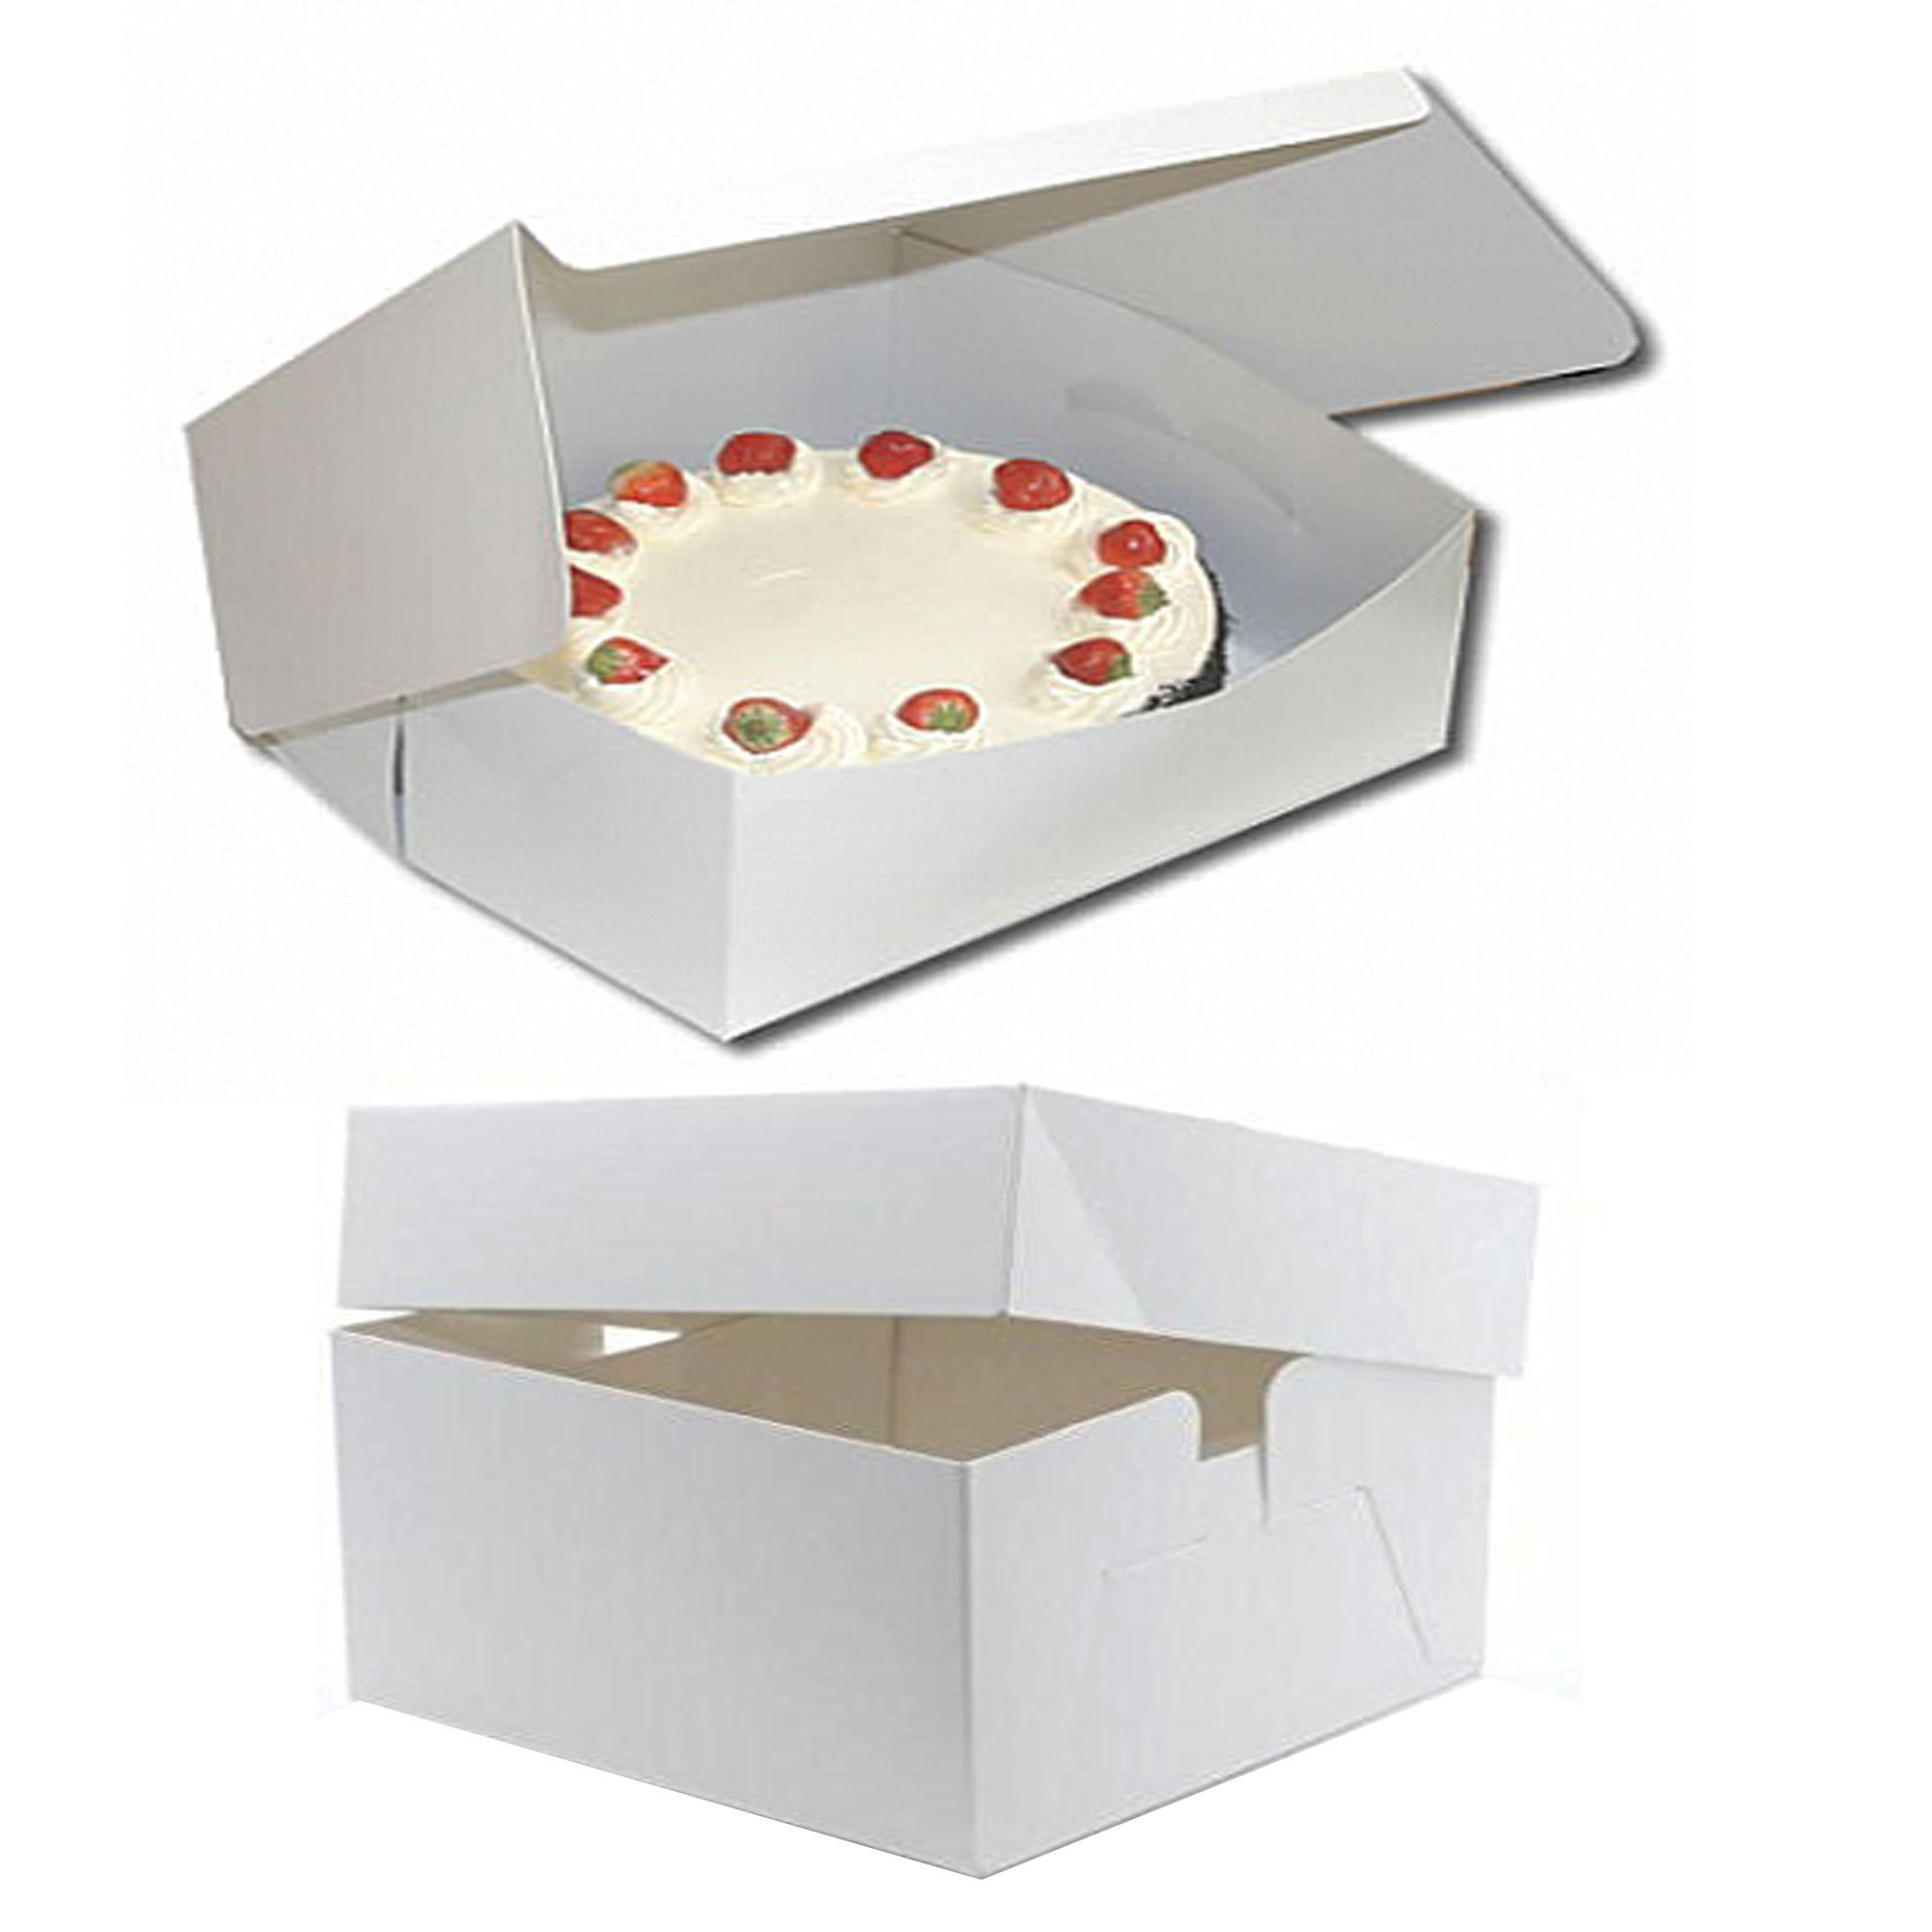 Folding Board Cake Boxes